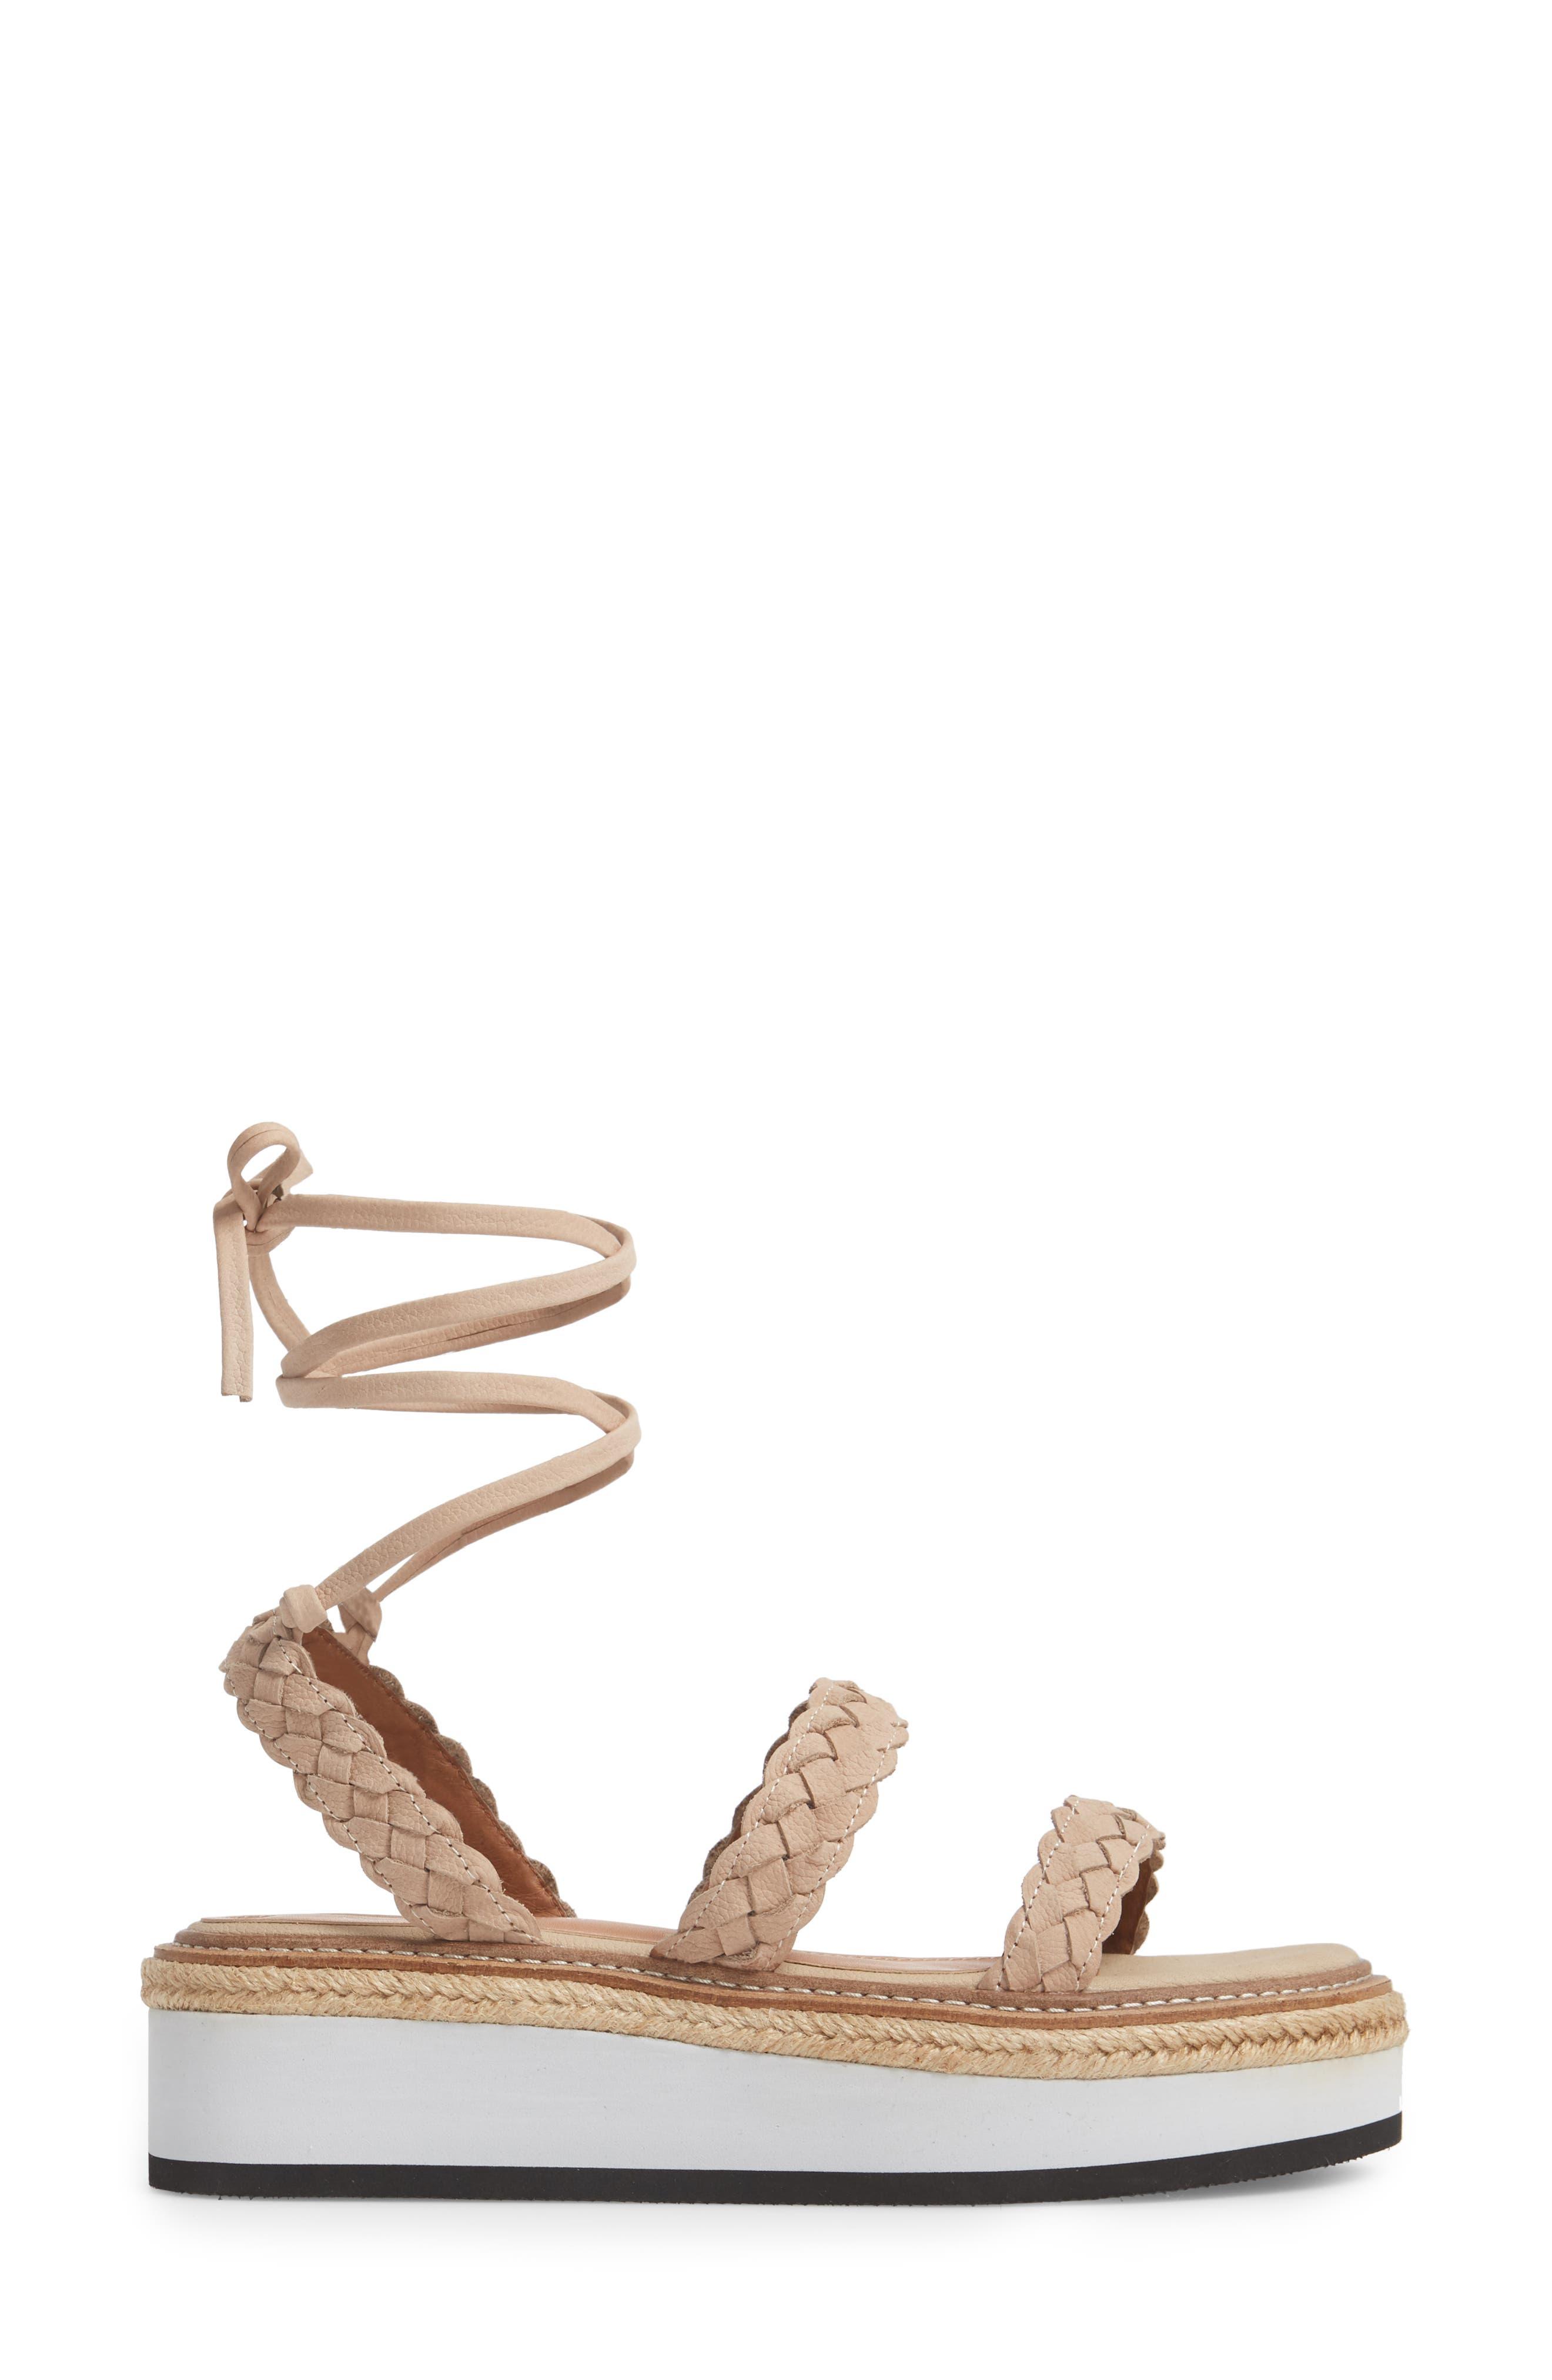 Nieve Braided Platform Sandal,                             Alternate thumbnail 3, color,                             Natural Leather